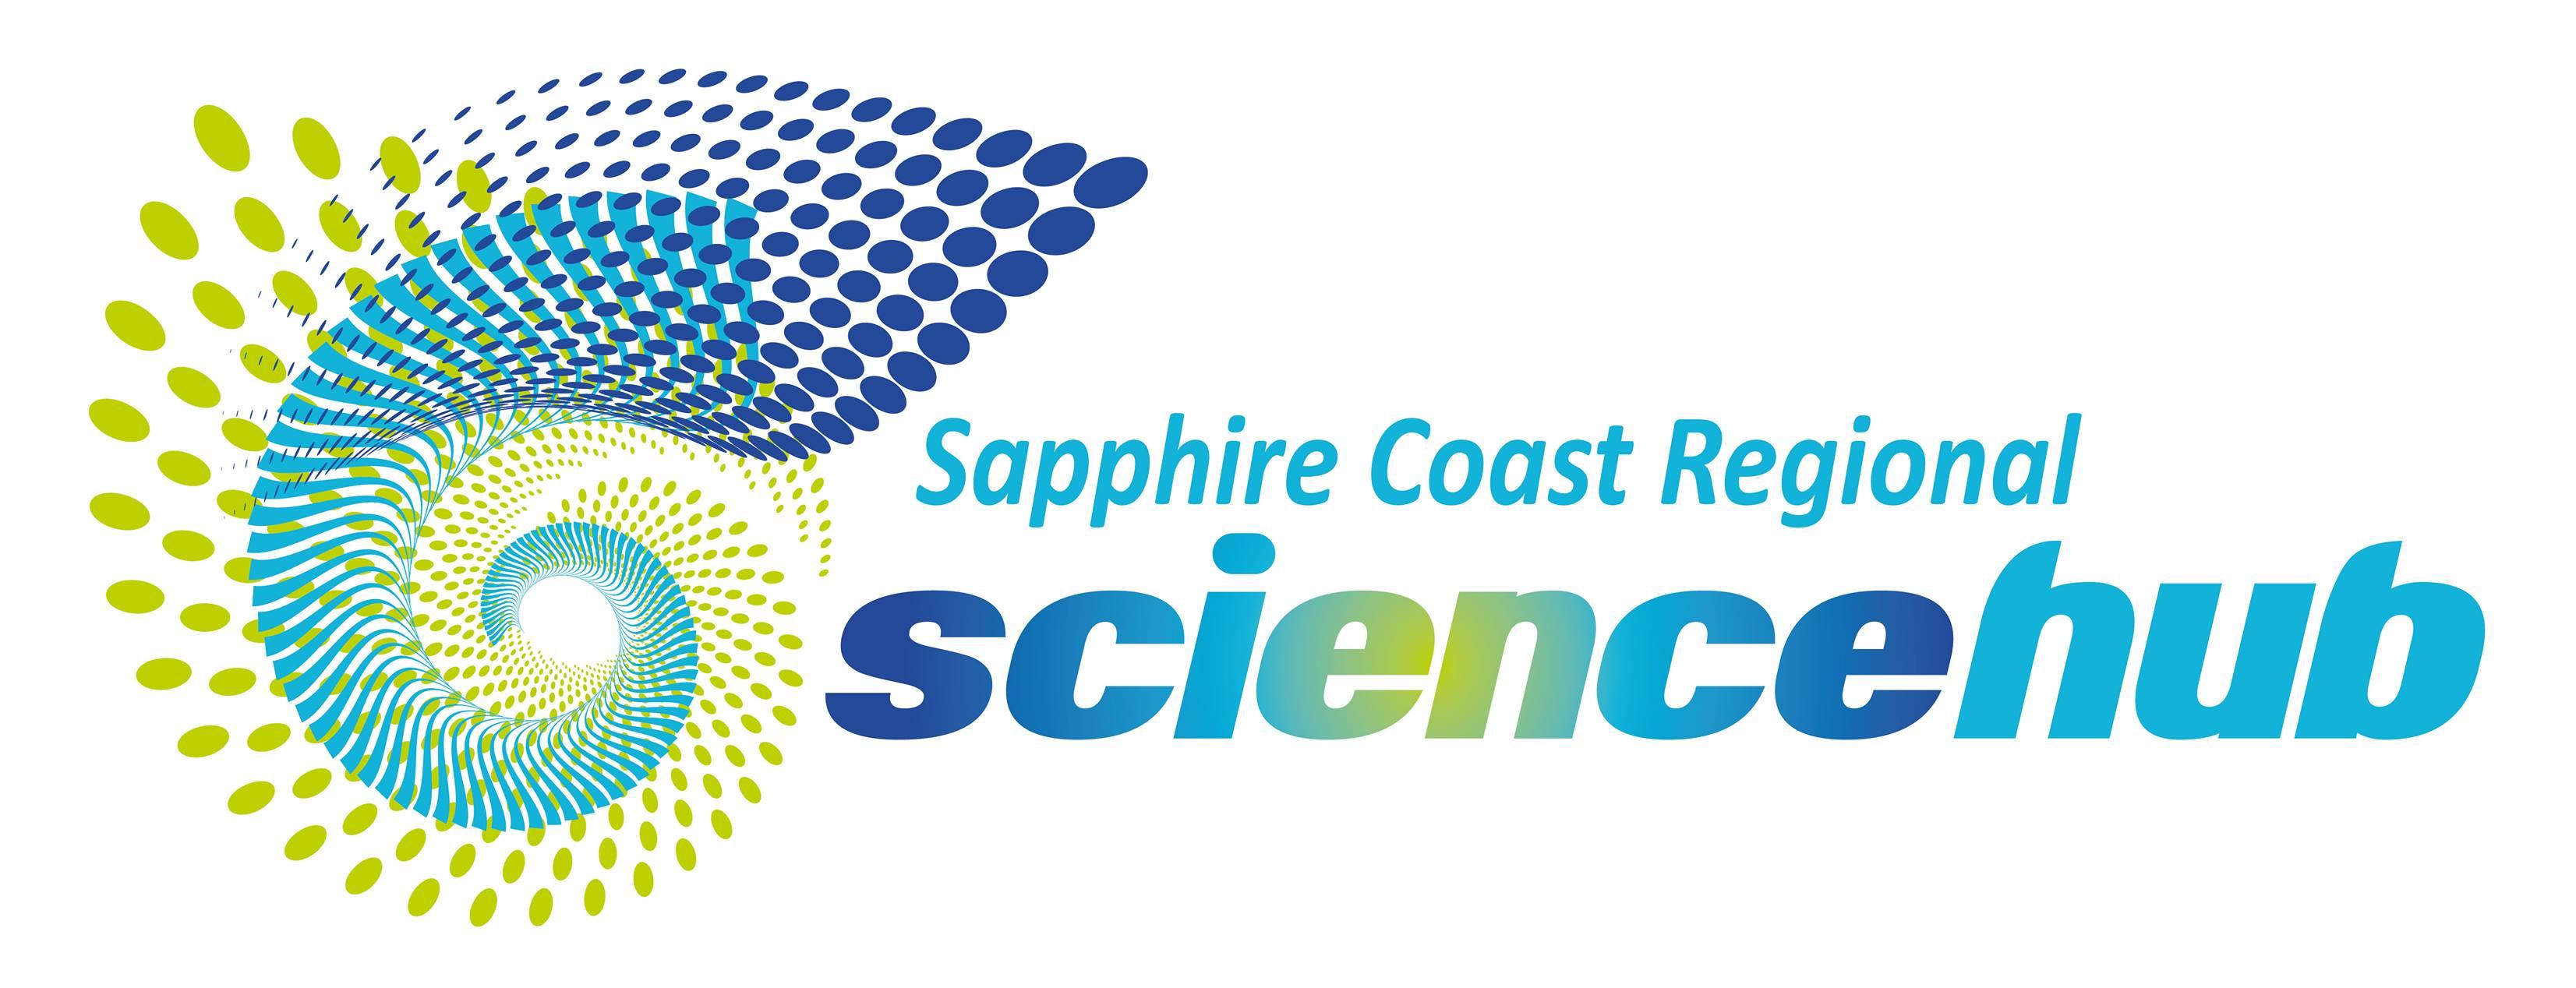 Sapphire Coast Regional Science Hub logo